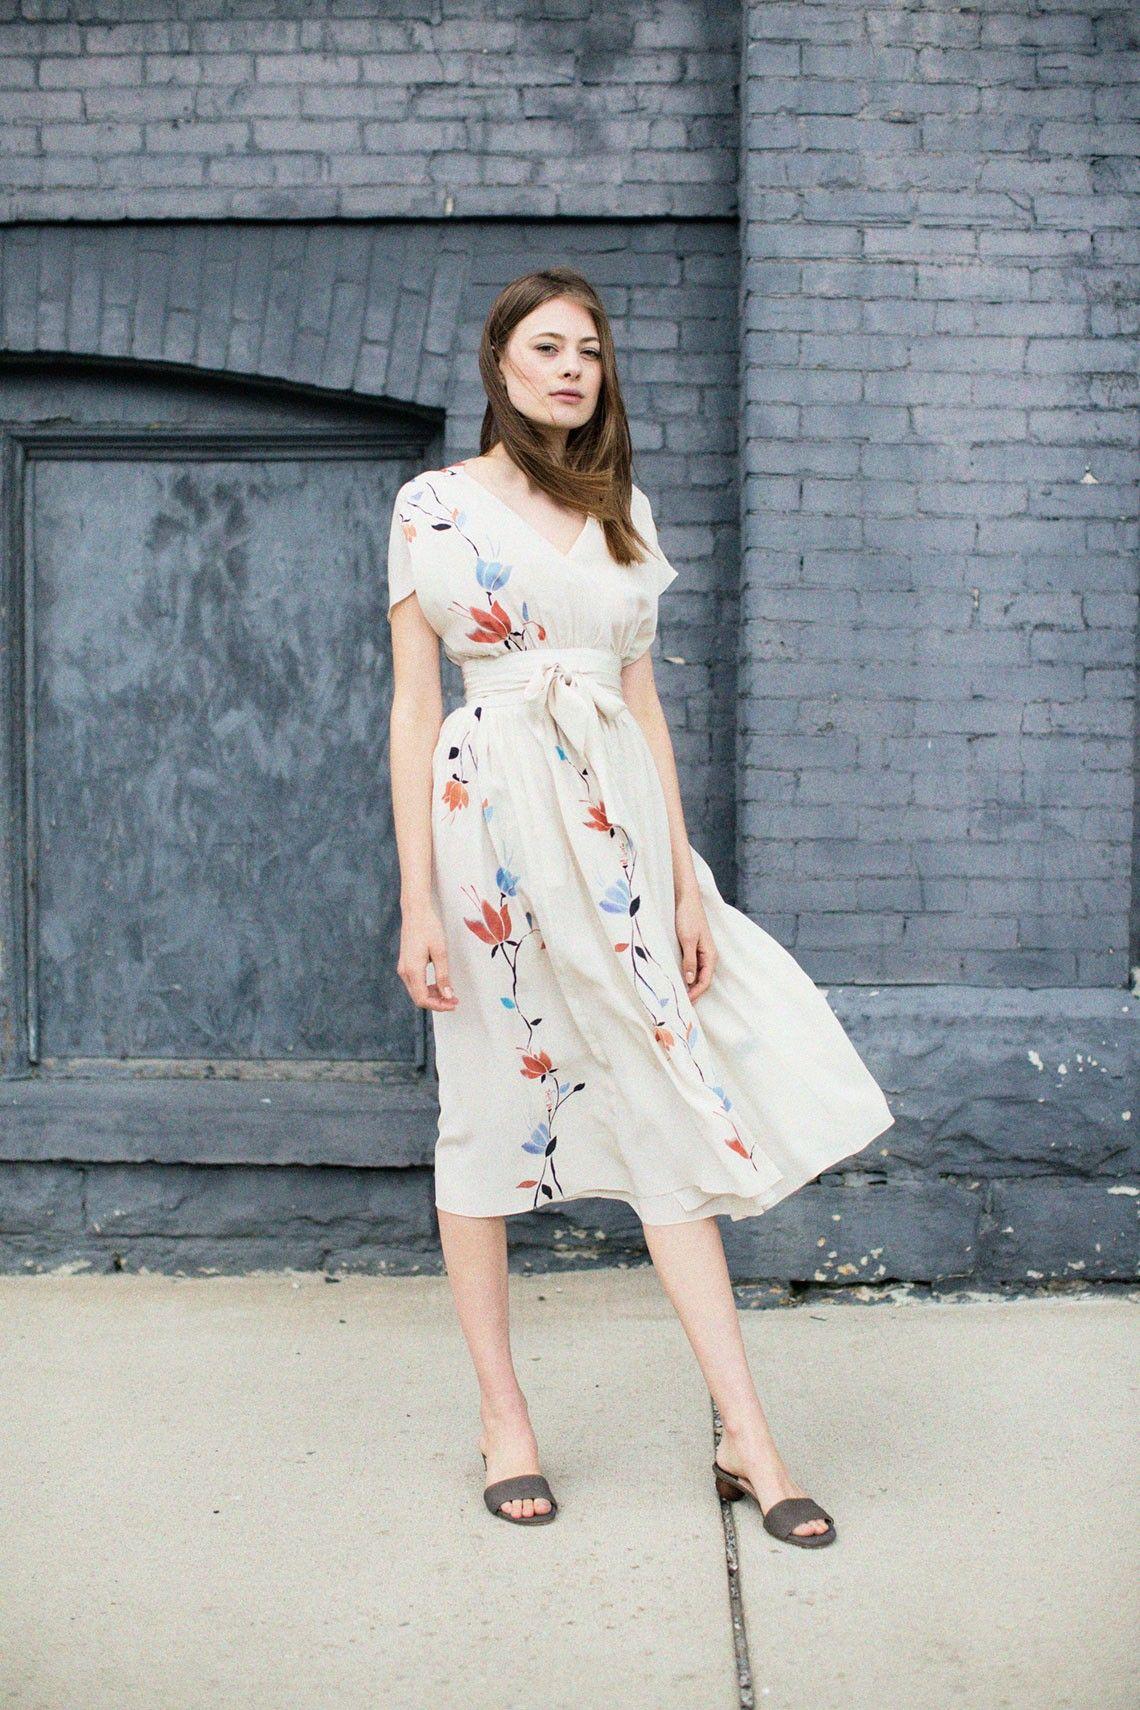 No. 6 - Vine Scarlett Dress BONA DRAG | Clothes for olive | Pinterest